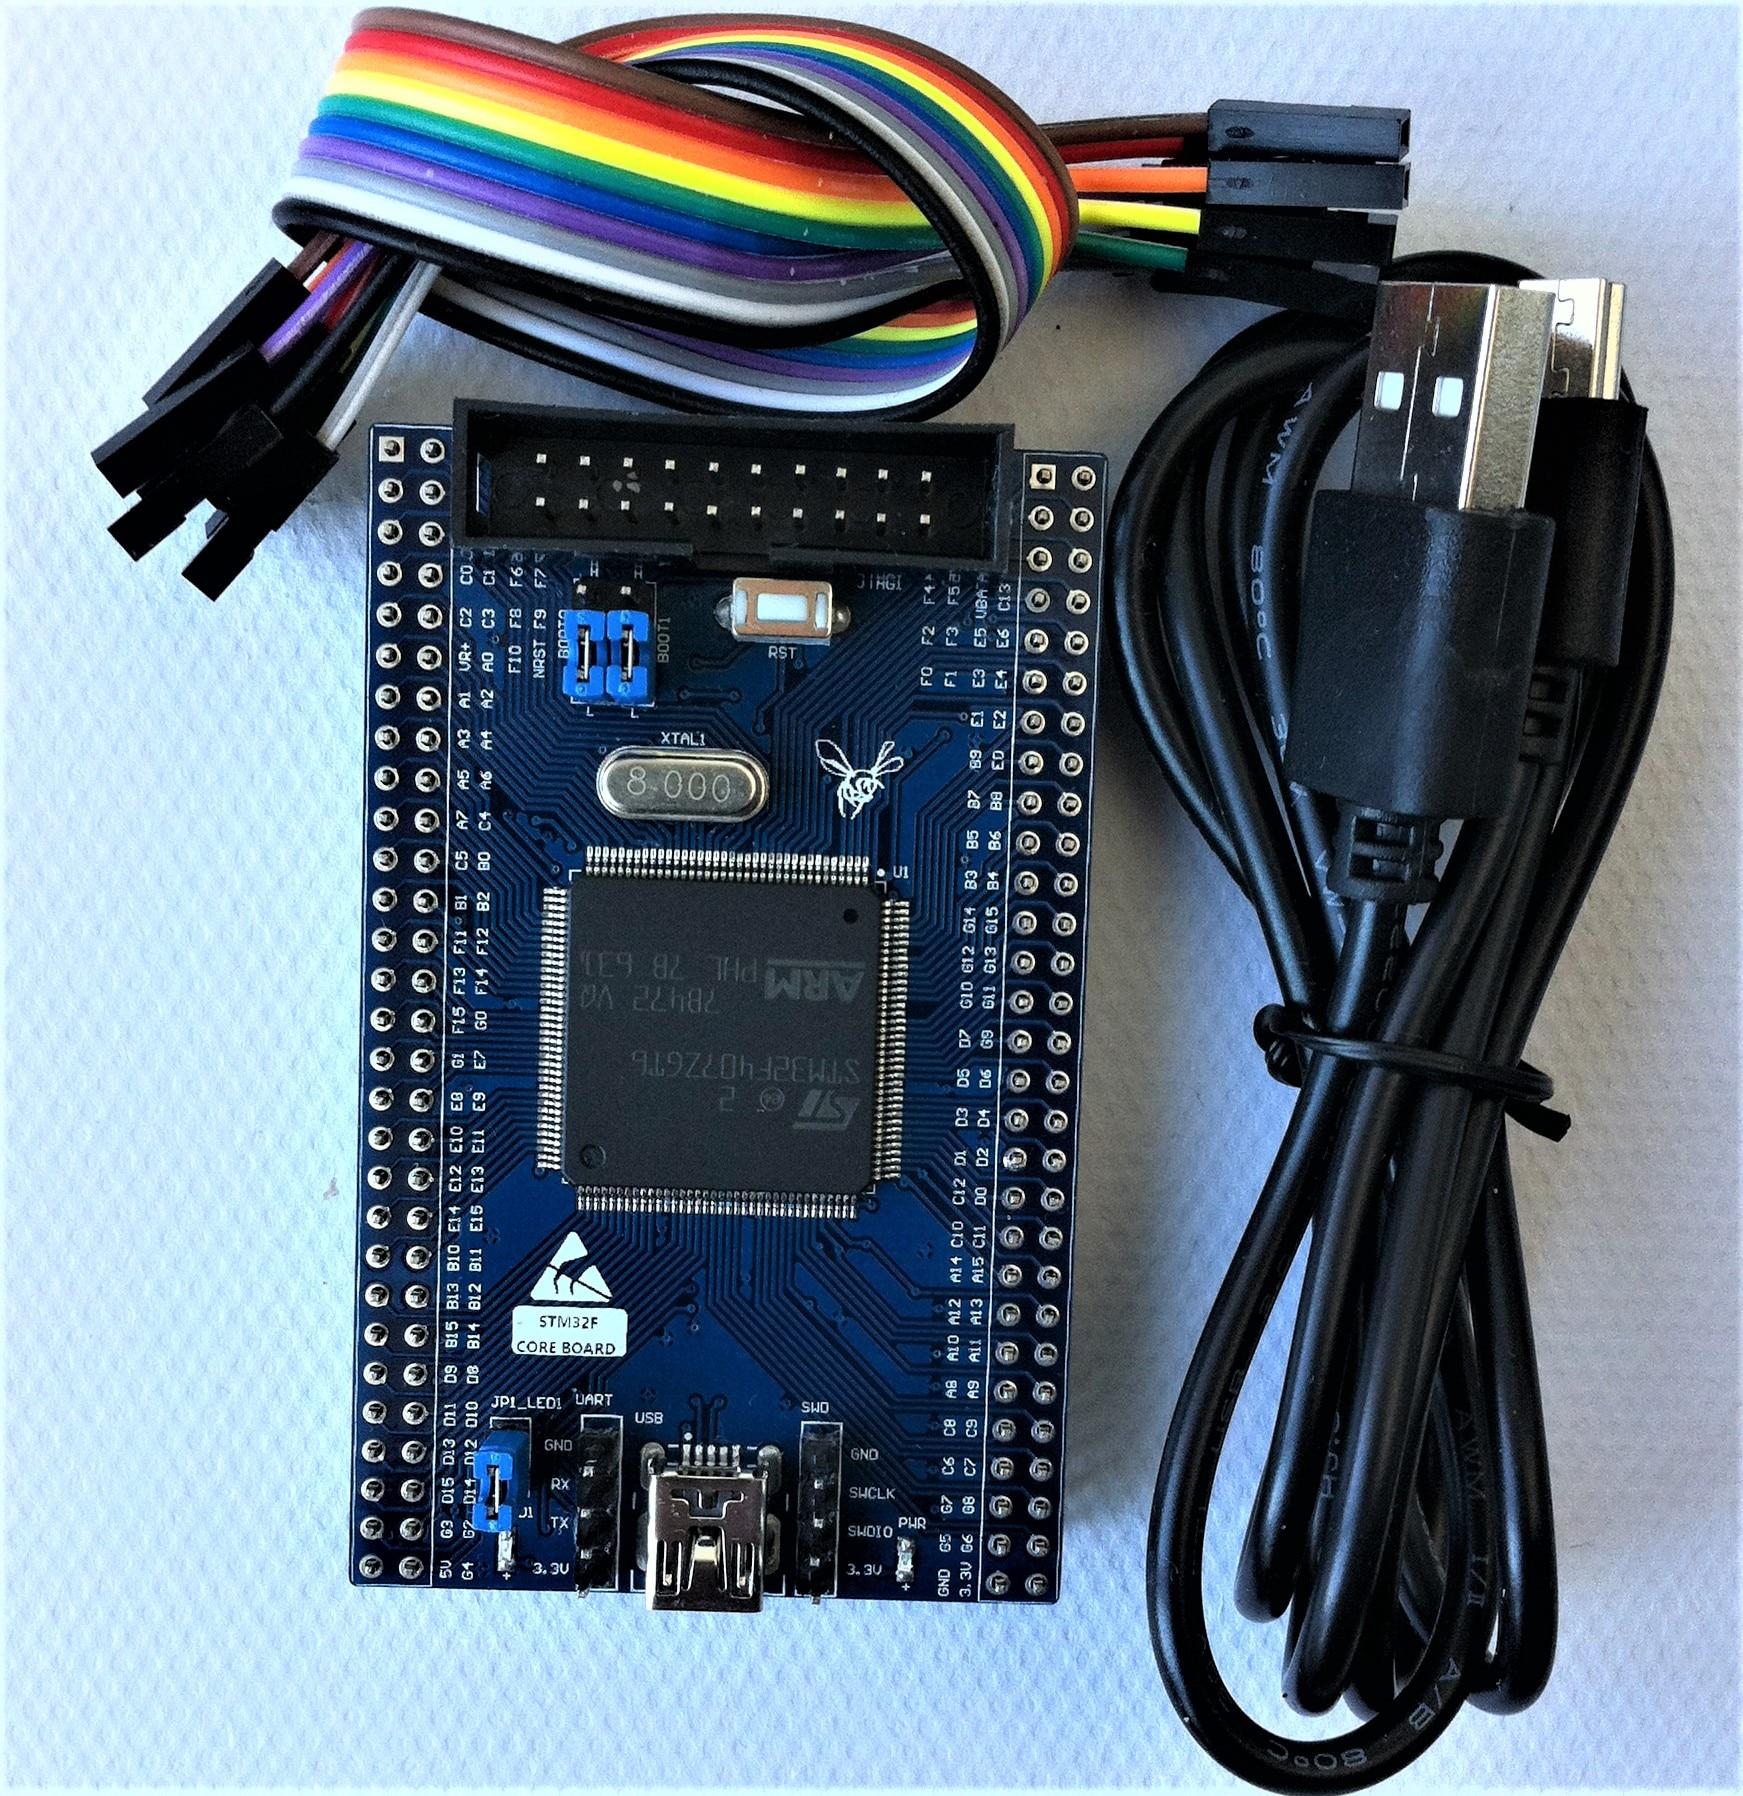 STM32F407 الأساسية مجلس الحد الأدنى لنظام STM32F407ZGT6 تطوير مجلس STM32F407ZG